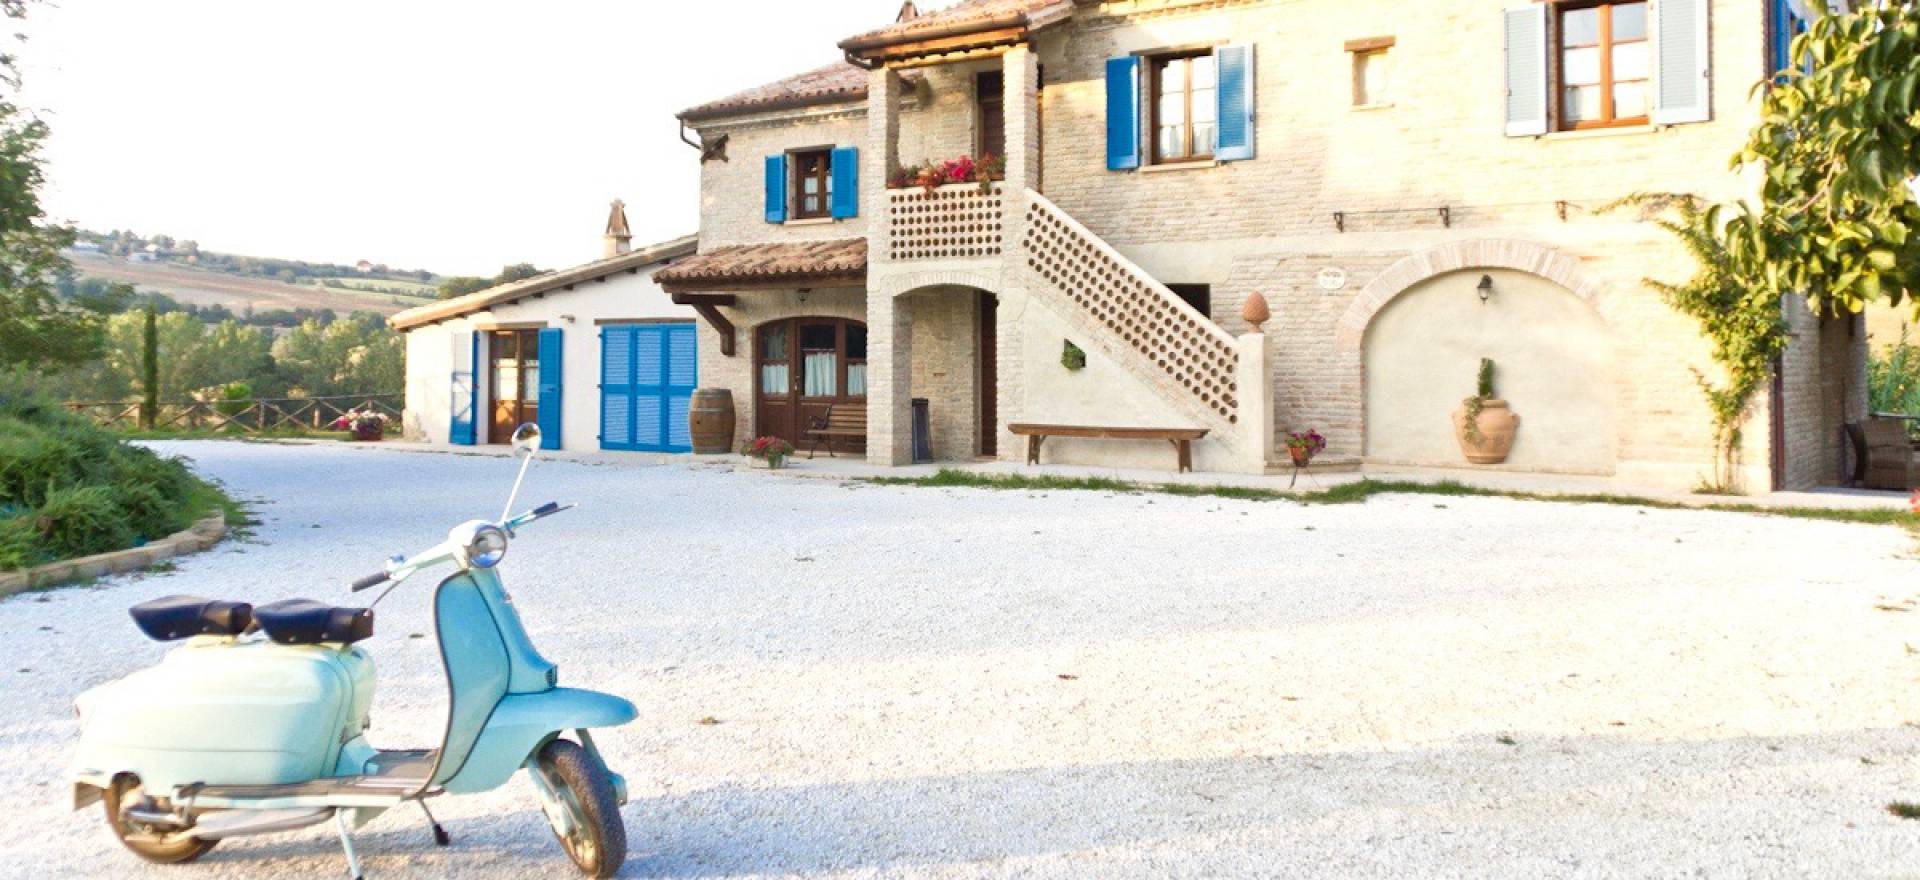 Agriturismo Marche Knusse agriturismo bij authentiek dorpje in le Marche